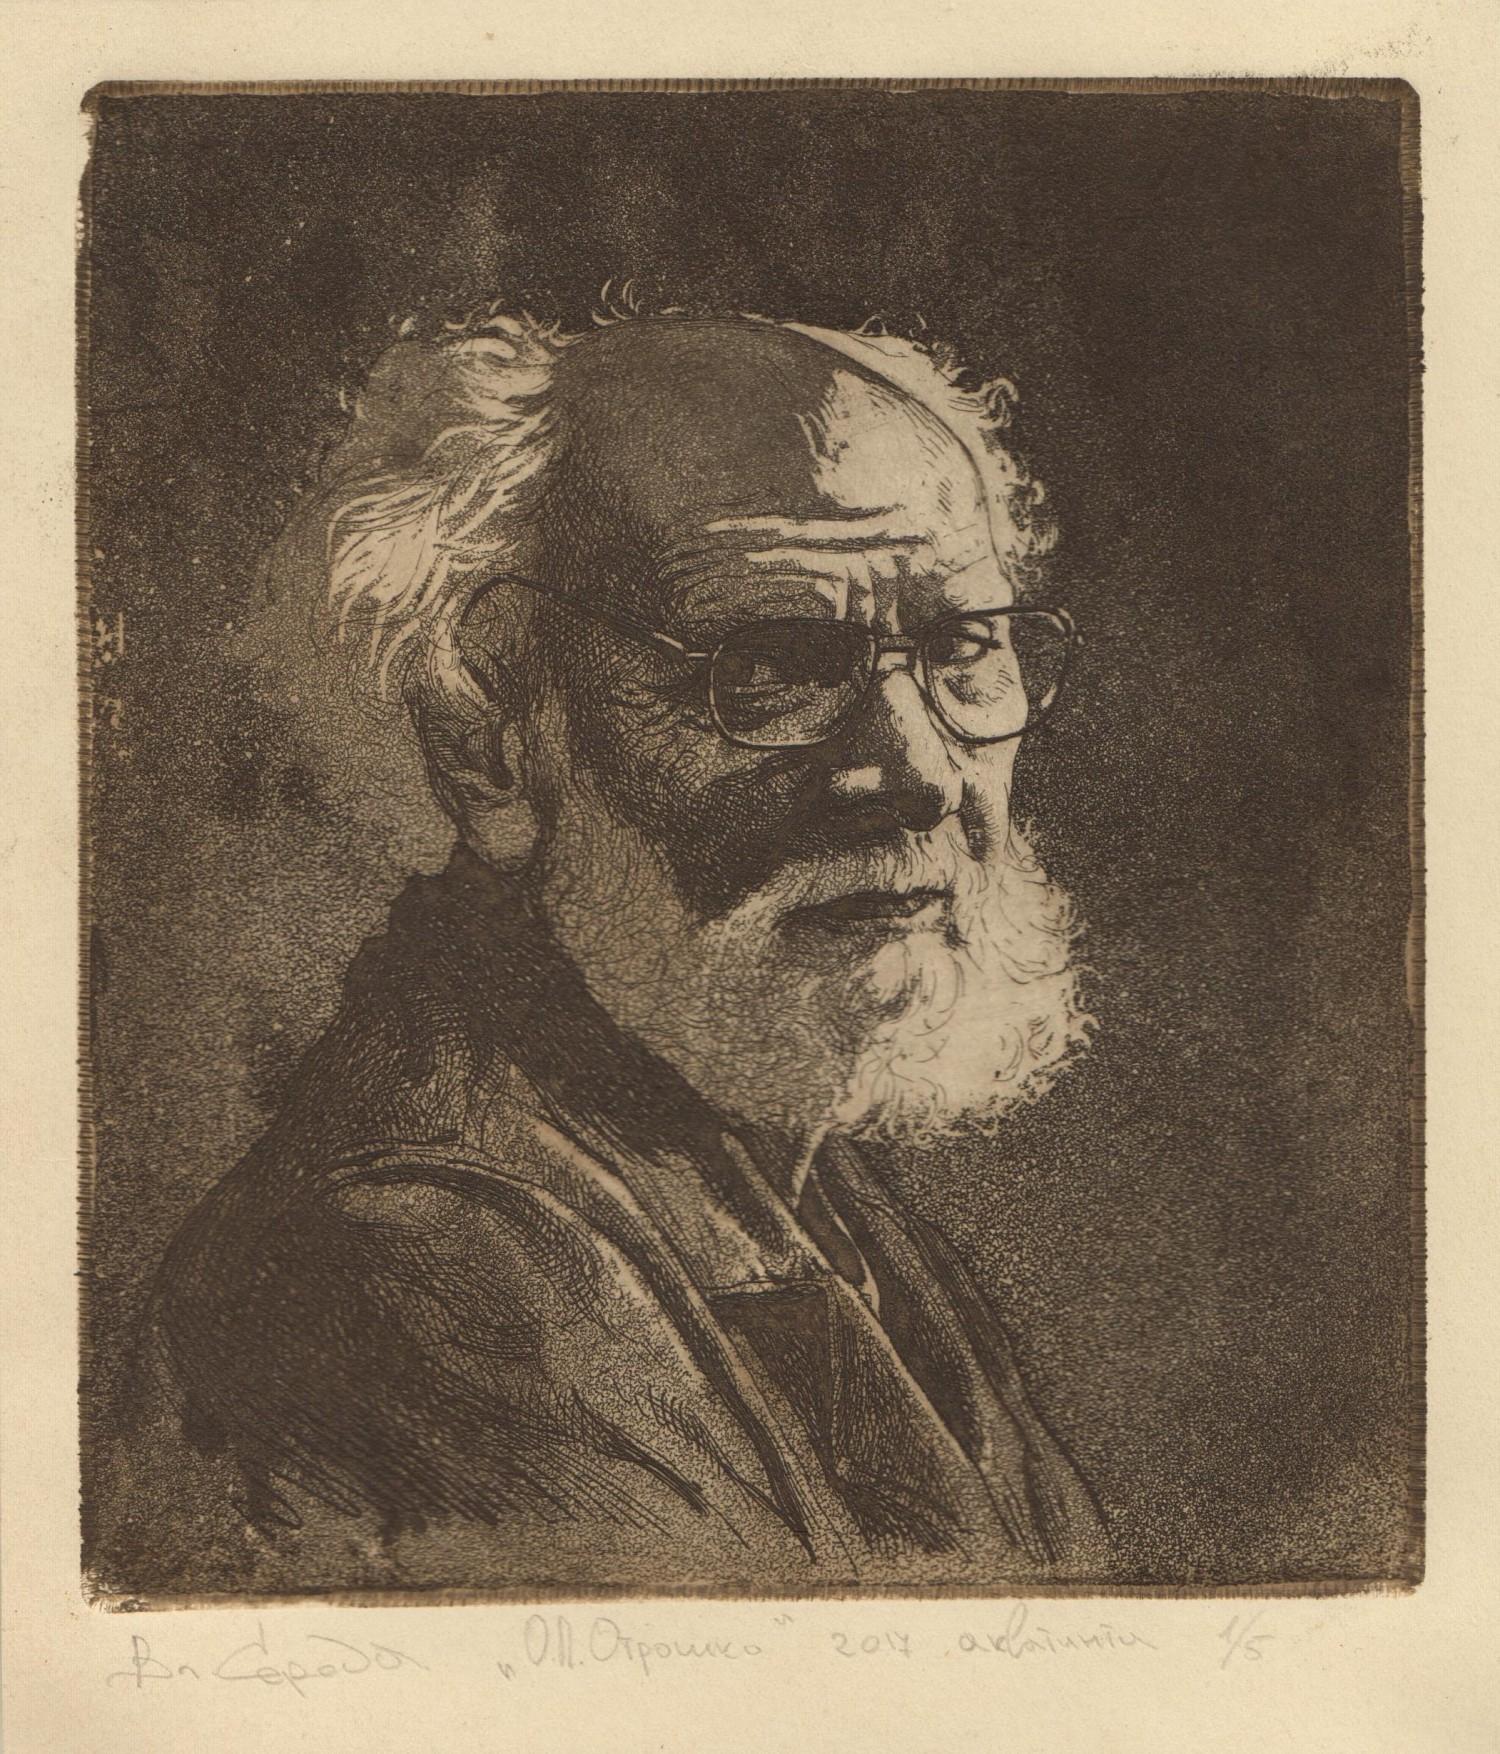 В.М.Барсуков (Середа). О.П.Отрошко. 2017, акватинта.